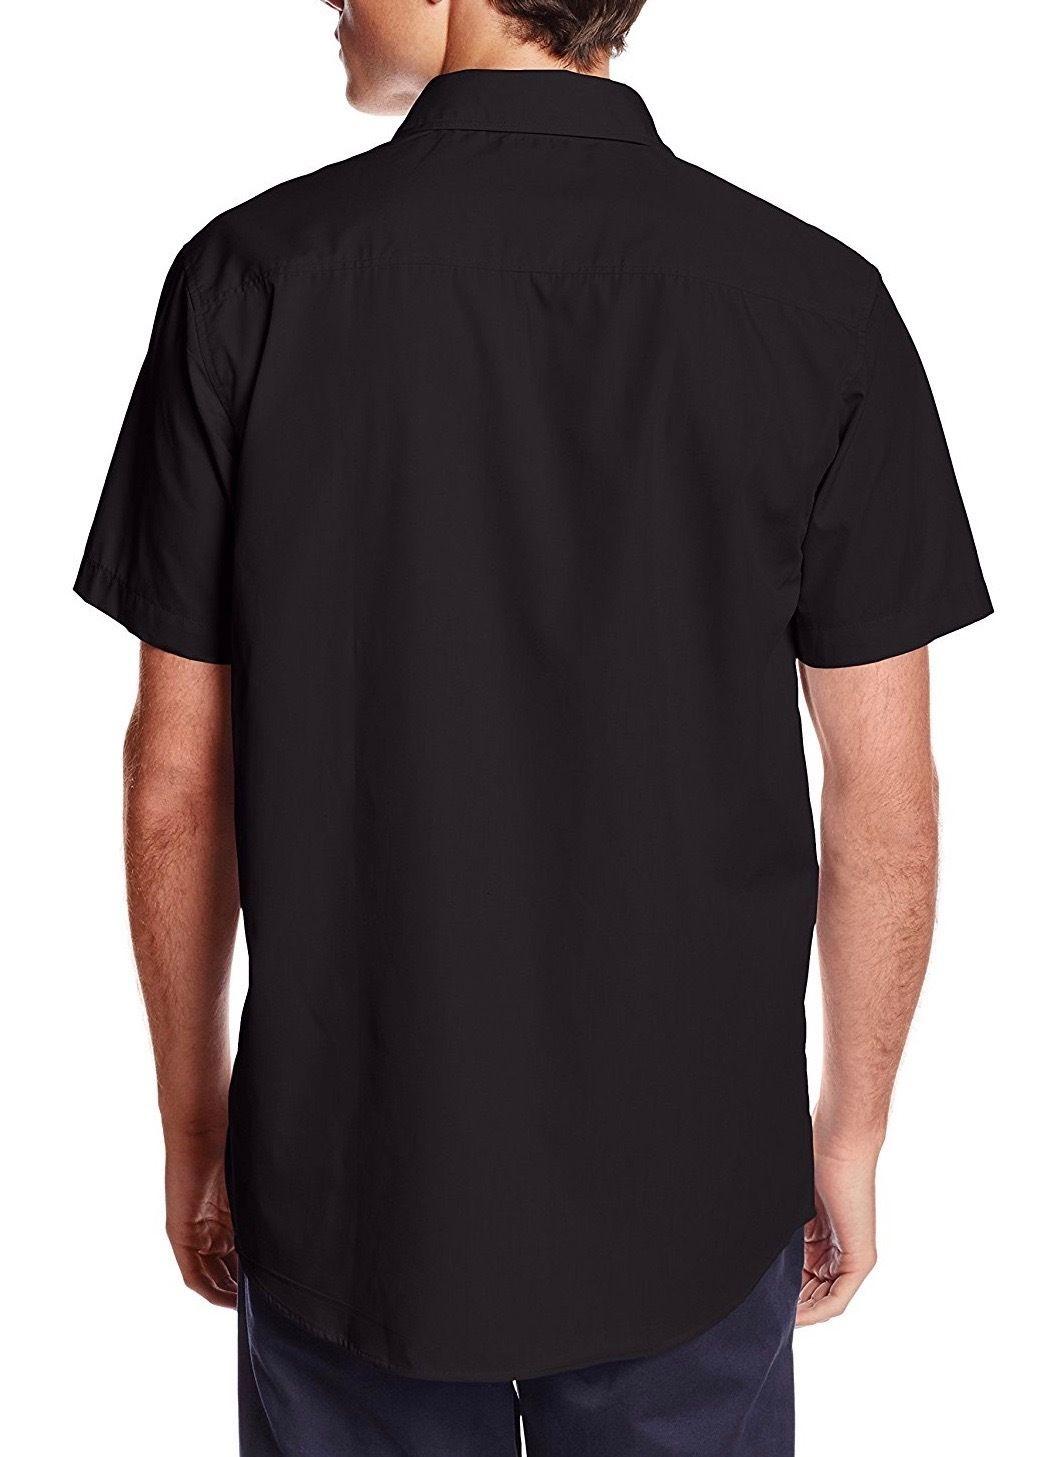 Berlioni-Italy-Men-039-s-Premium-Classic-Button-Down-Short-Sleeve-Solid-Dress-Shirt thumbnail 4